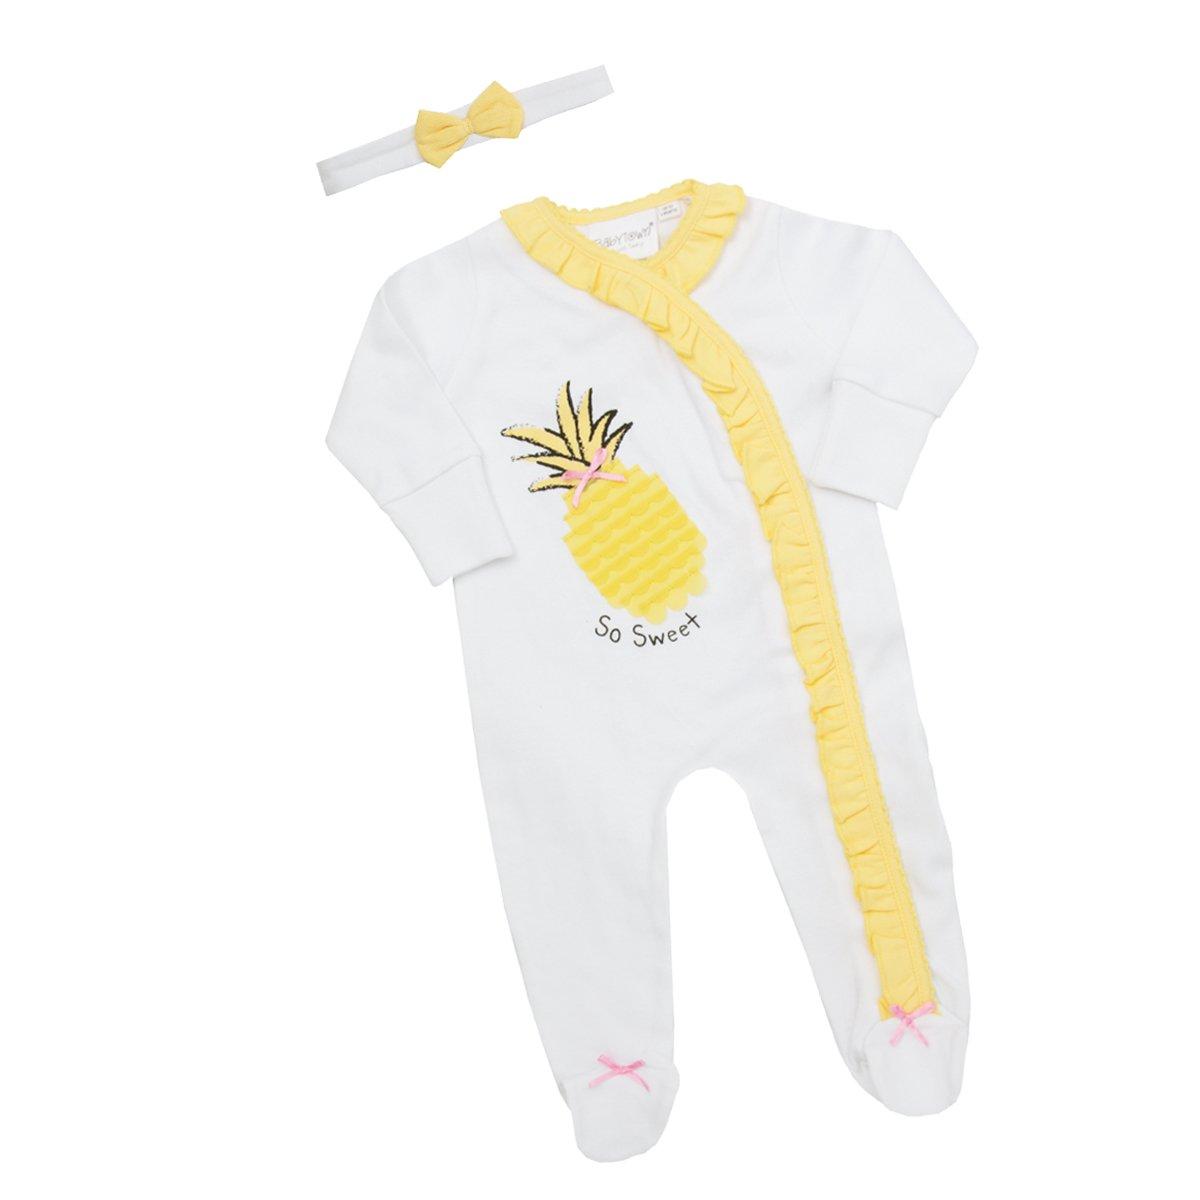 Babytown Baby Girls 2 Piece Sleepsuit & Headband Set